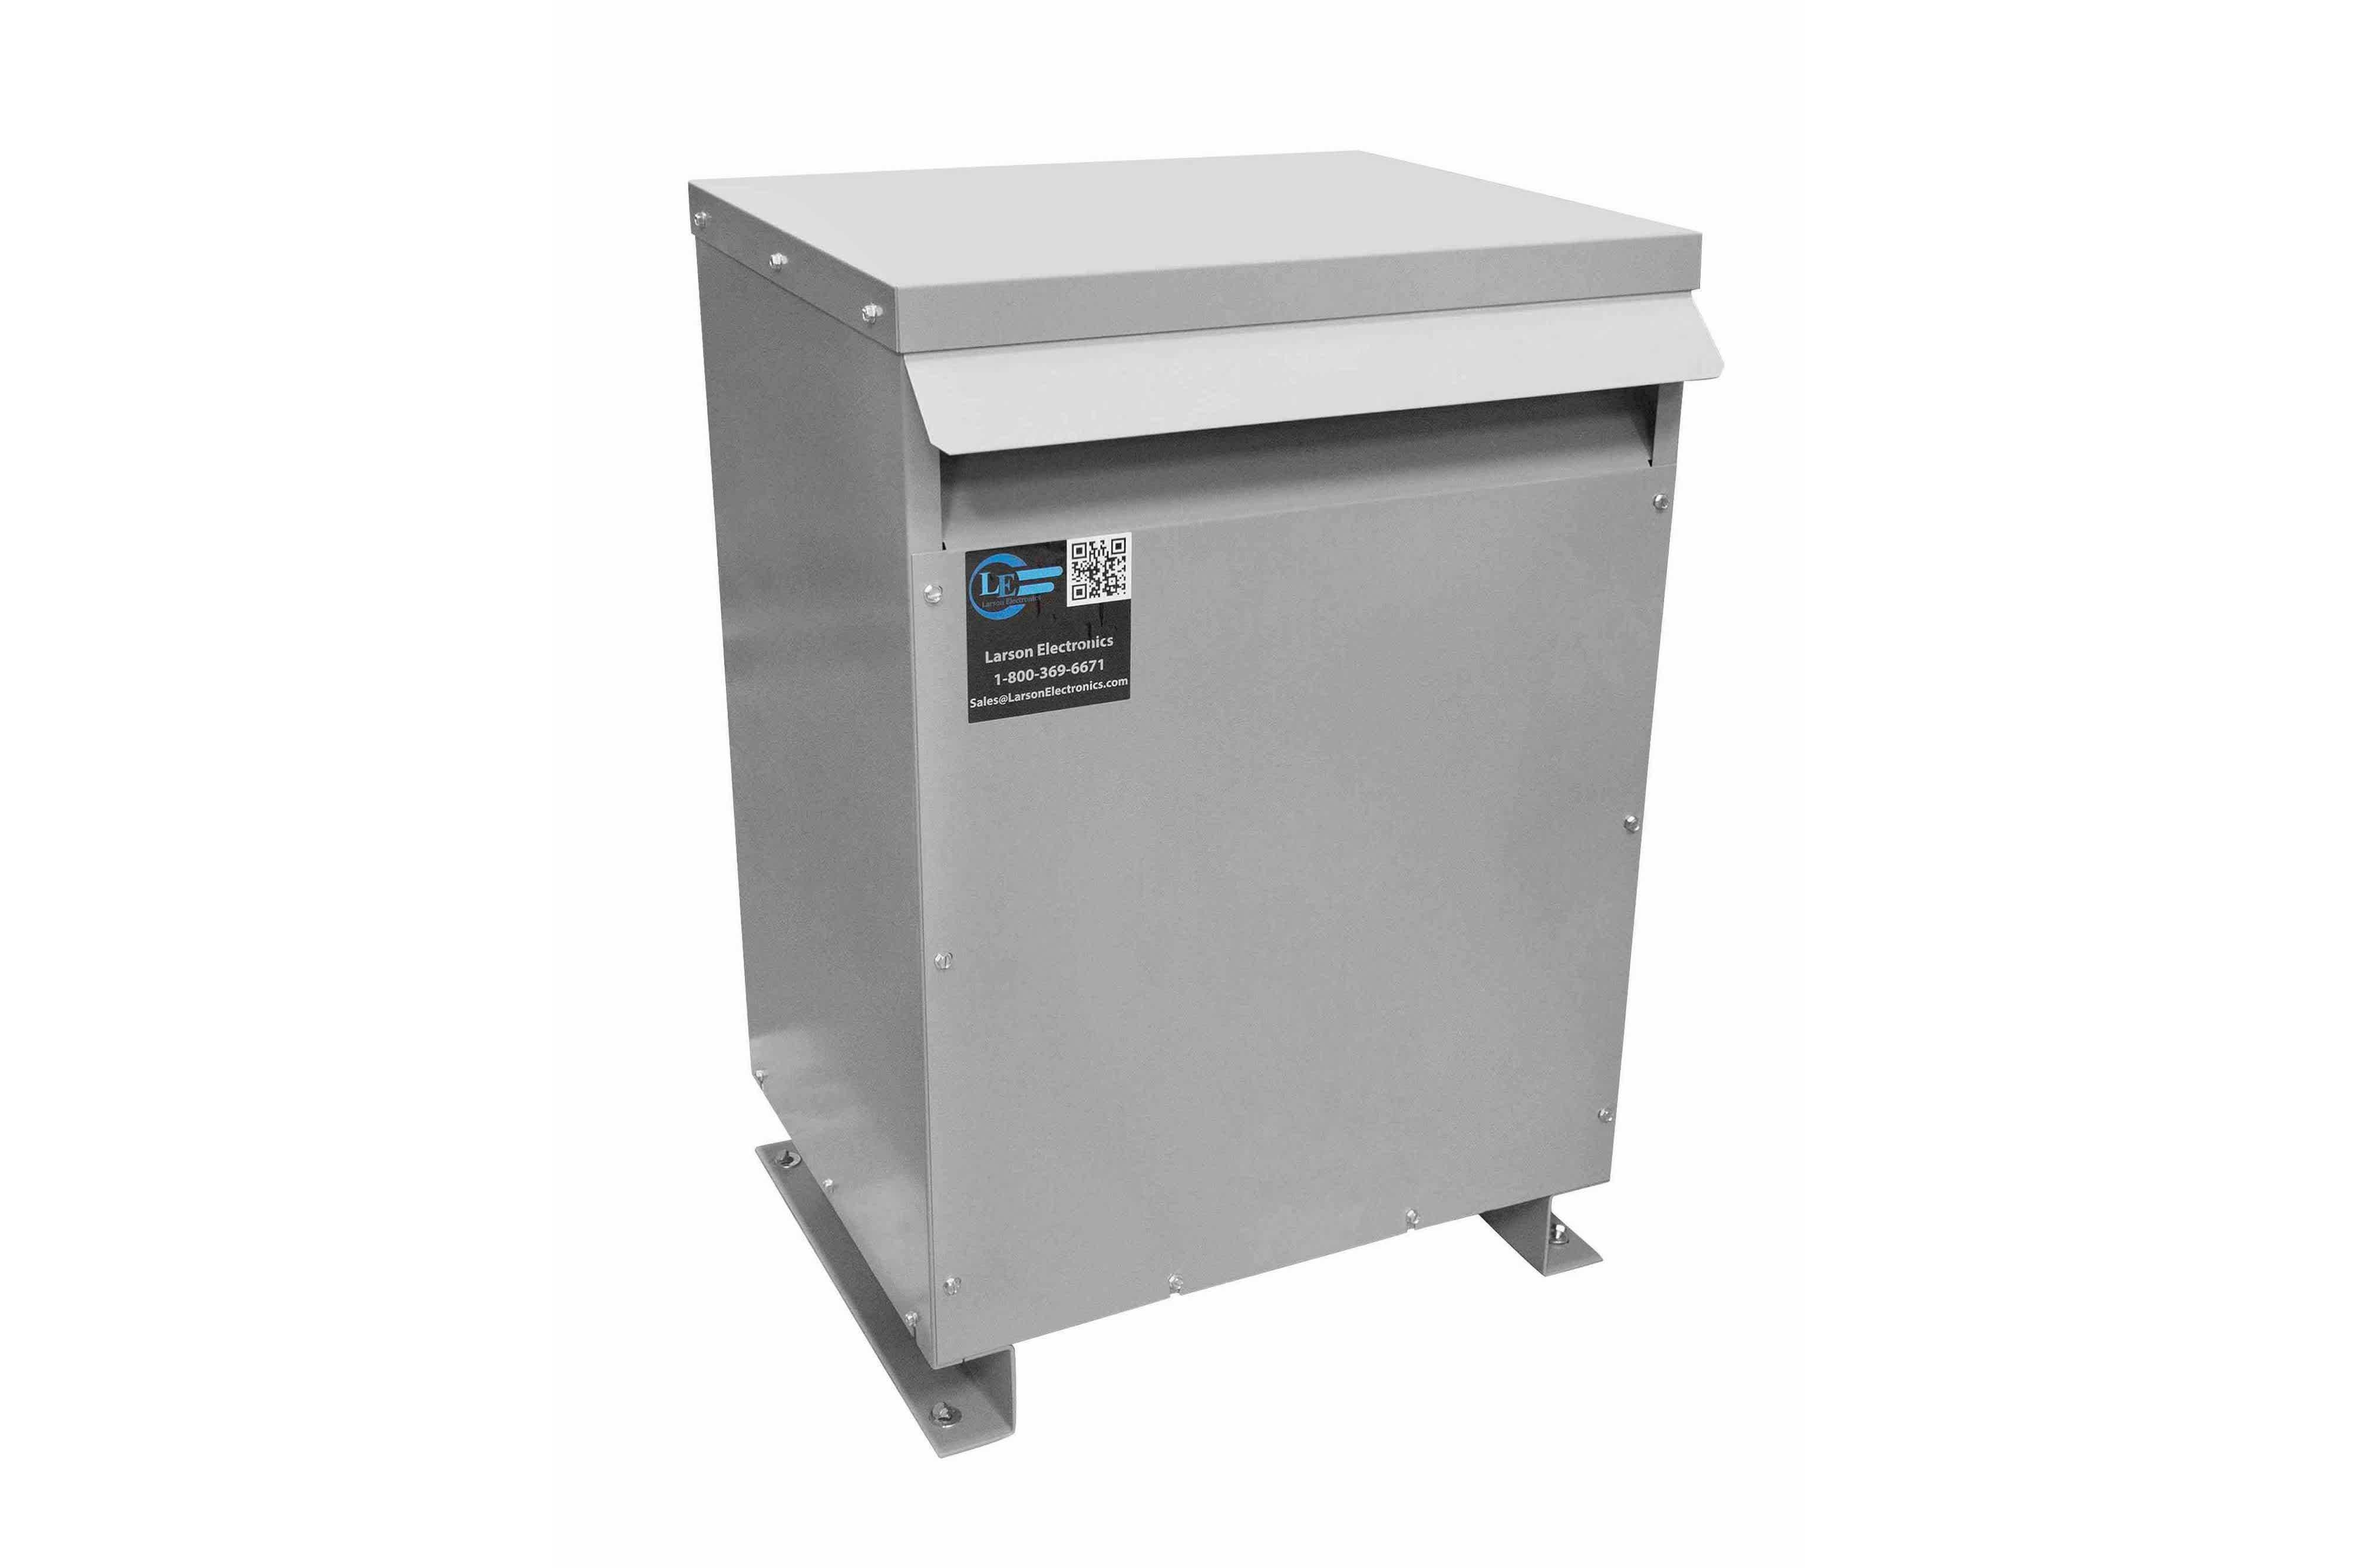 13 kVA 3PH Isolation Transformer, 460V Wye Primary, 208V Delta Secondary, N3R, Ventilated, 60 Hz